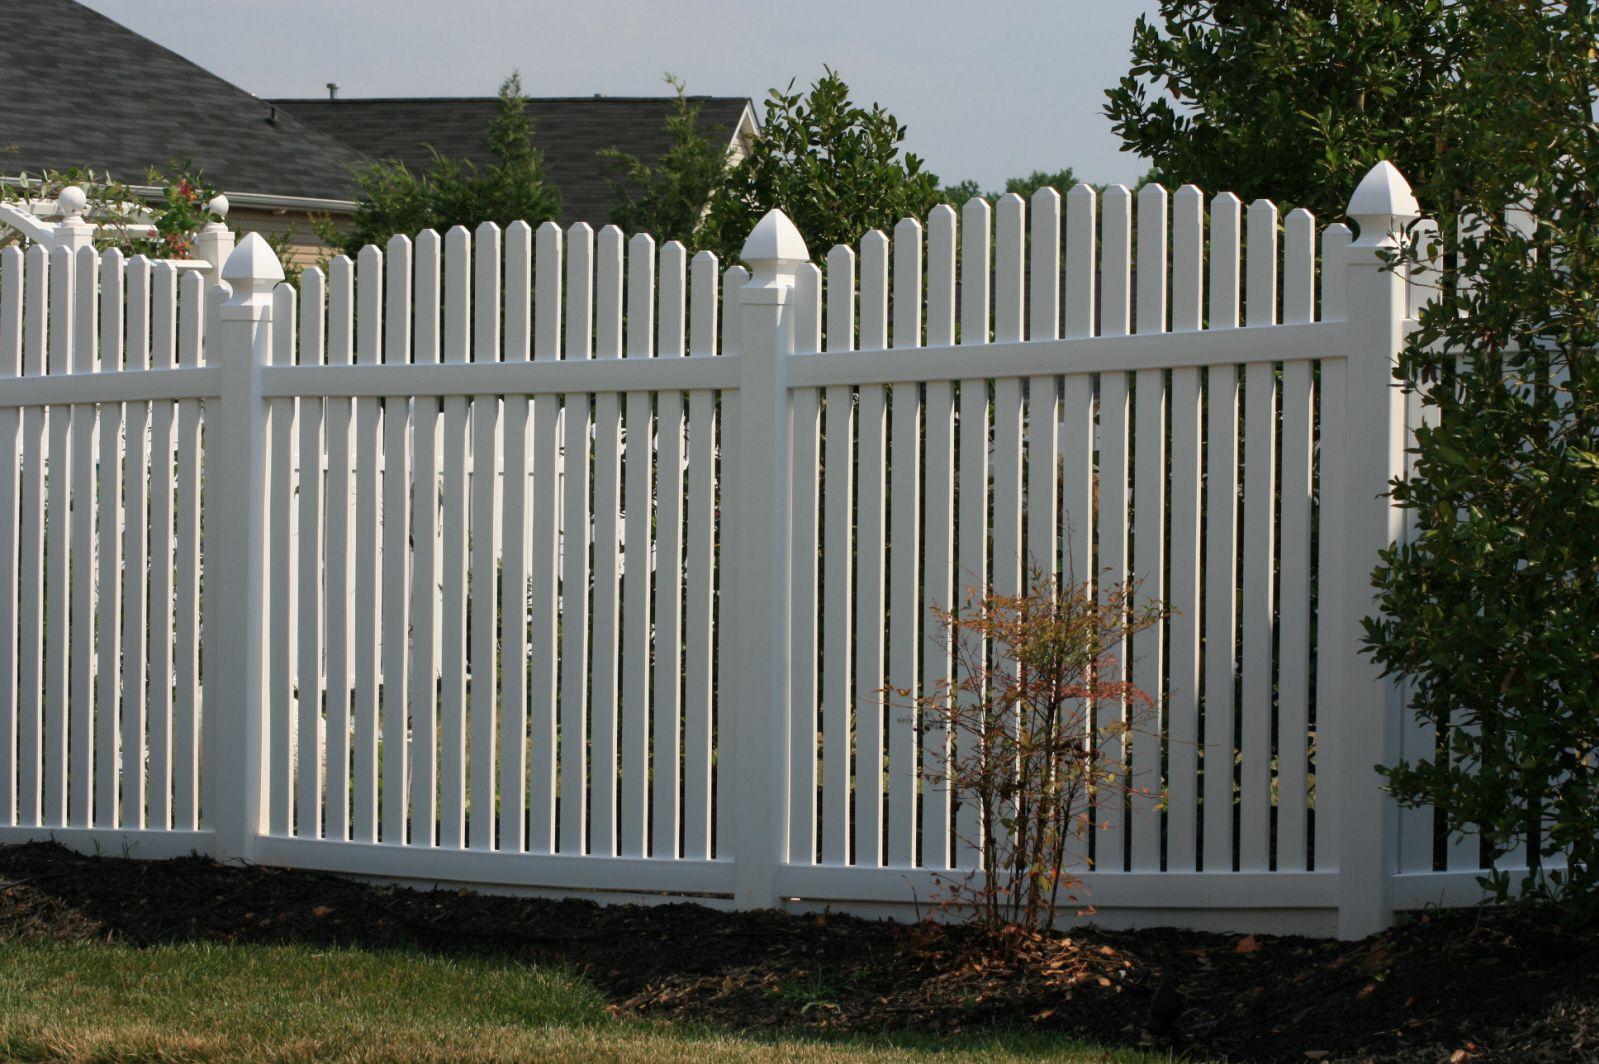 Vinyl fence pvc fence 5 arched picket gastonia fencing vinyl fence pvc fence 5 arched picket gastonia baanklon Images